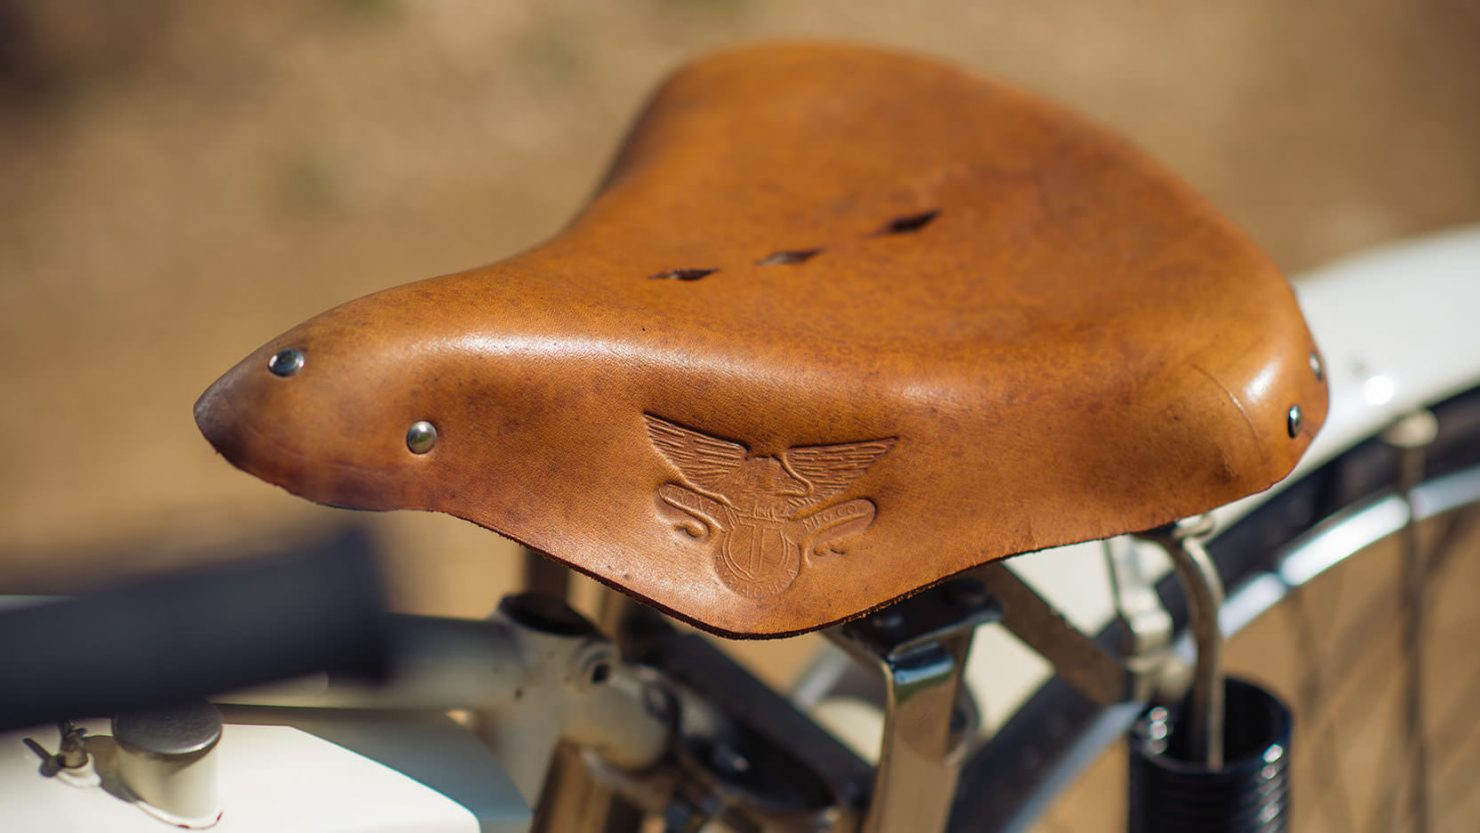 Thor Single Motorcycle 3 1480x833 - 1910 Thor Single